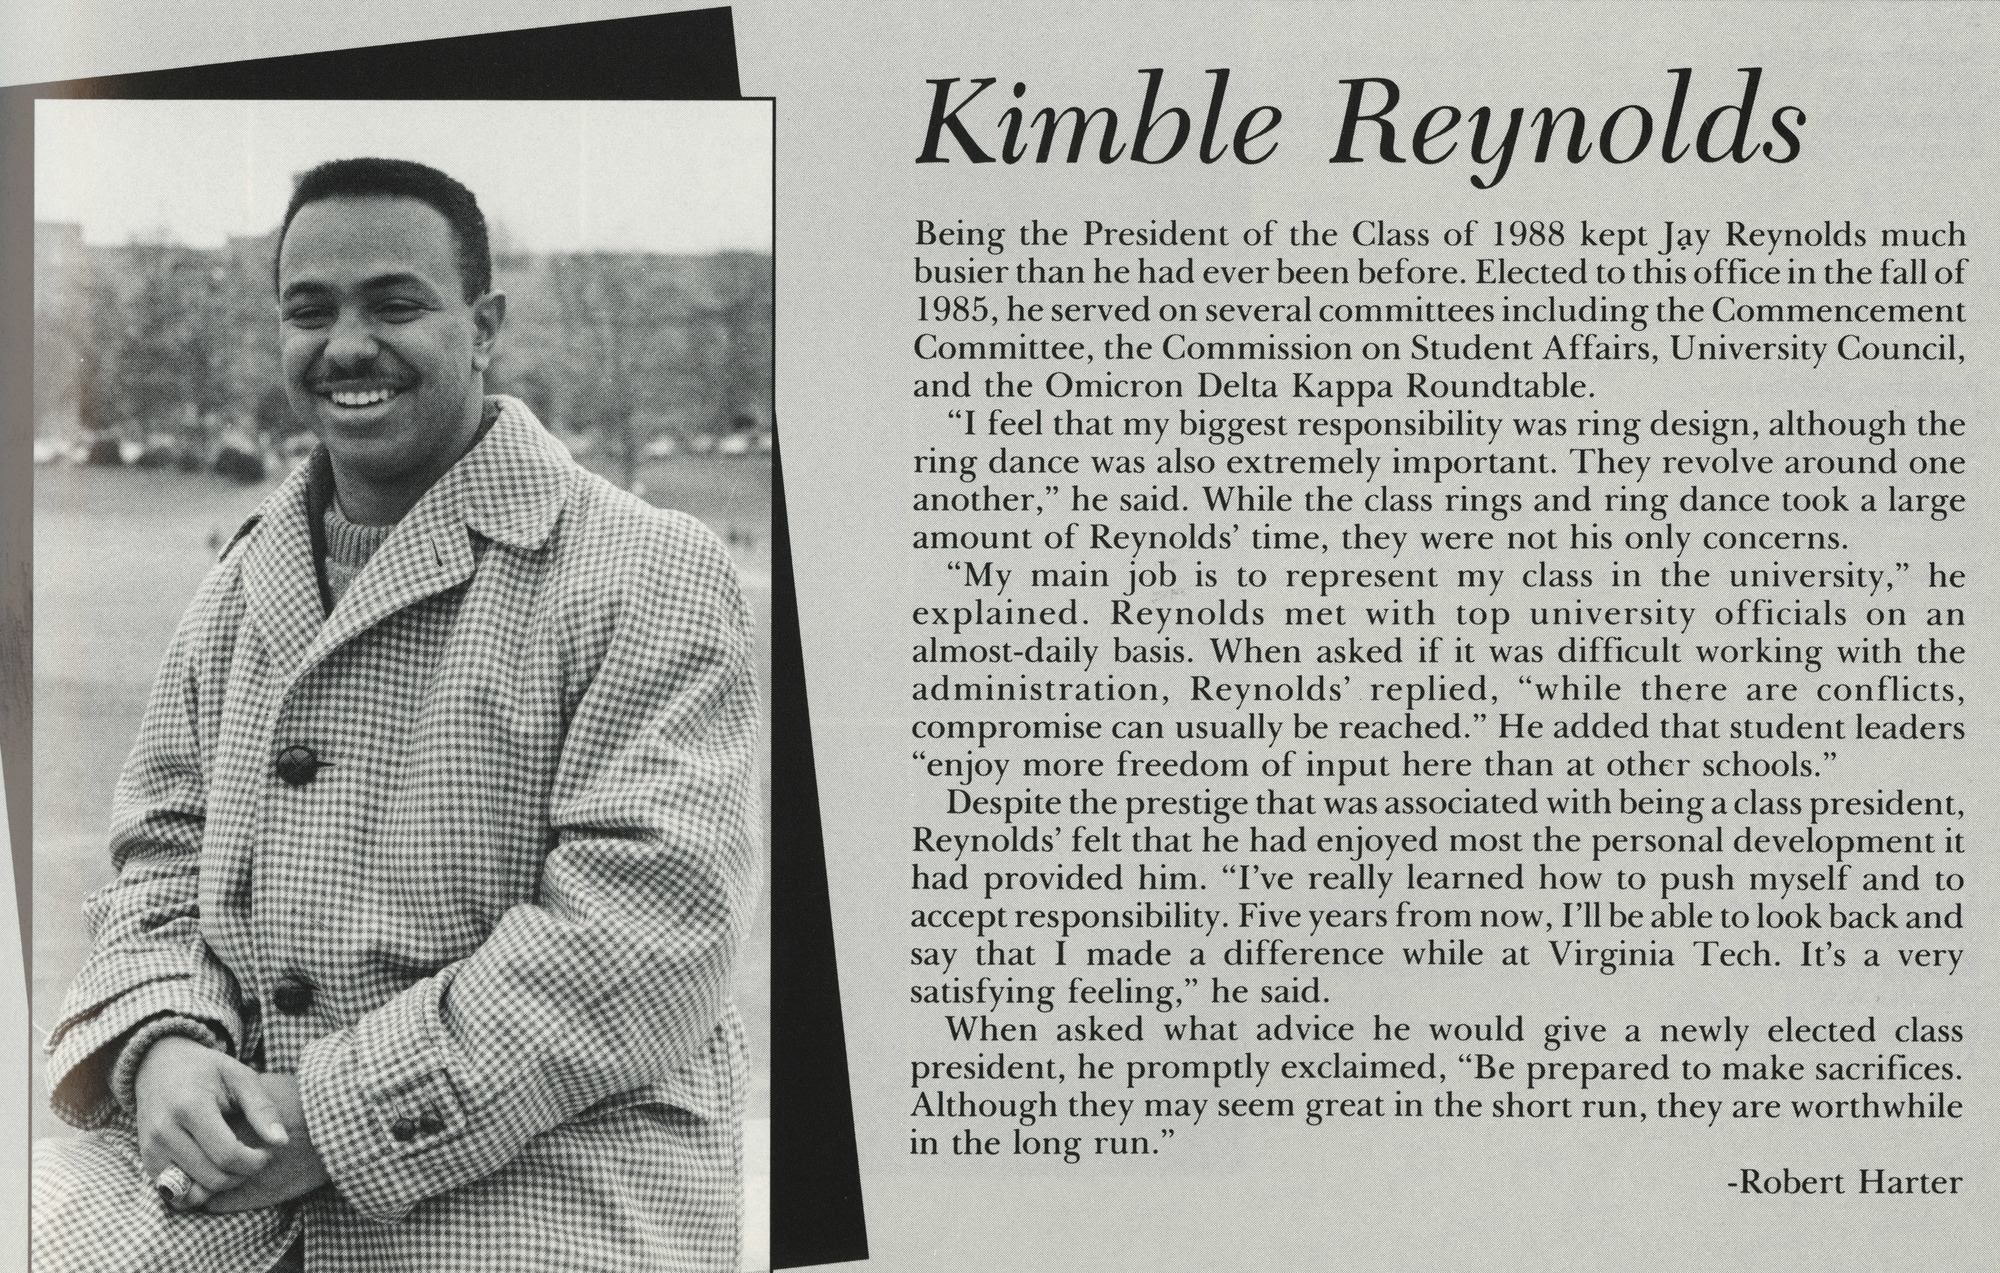 http://spec.lib.vt.edu/pickup/Omeka_upload/Bugle1988_pg295_KimbleReynolds.jpg